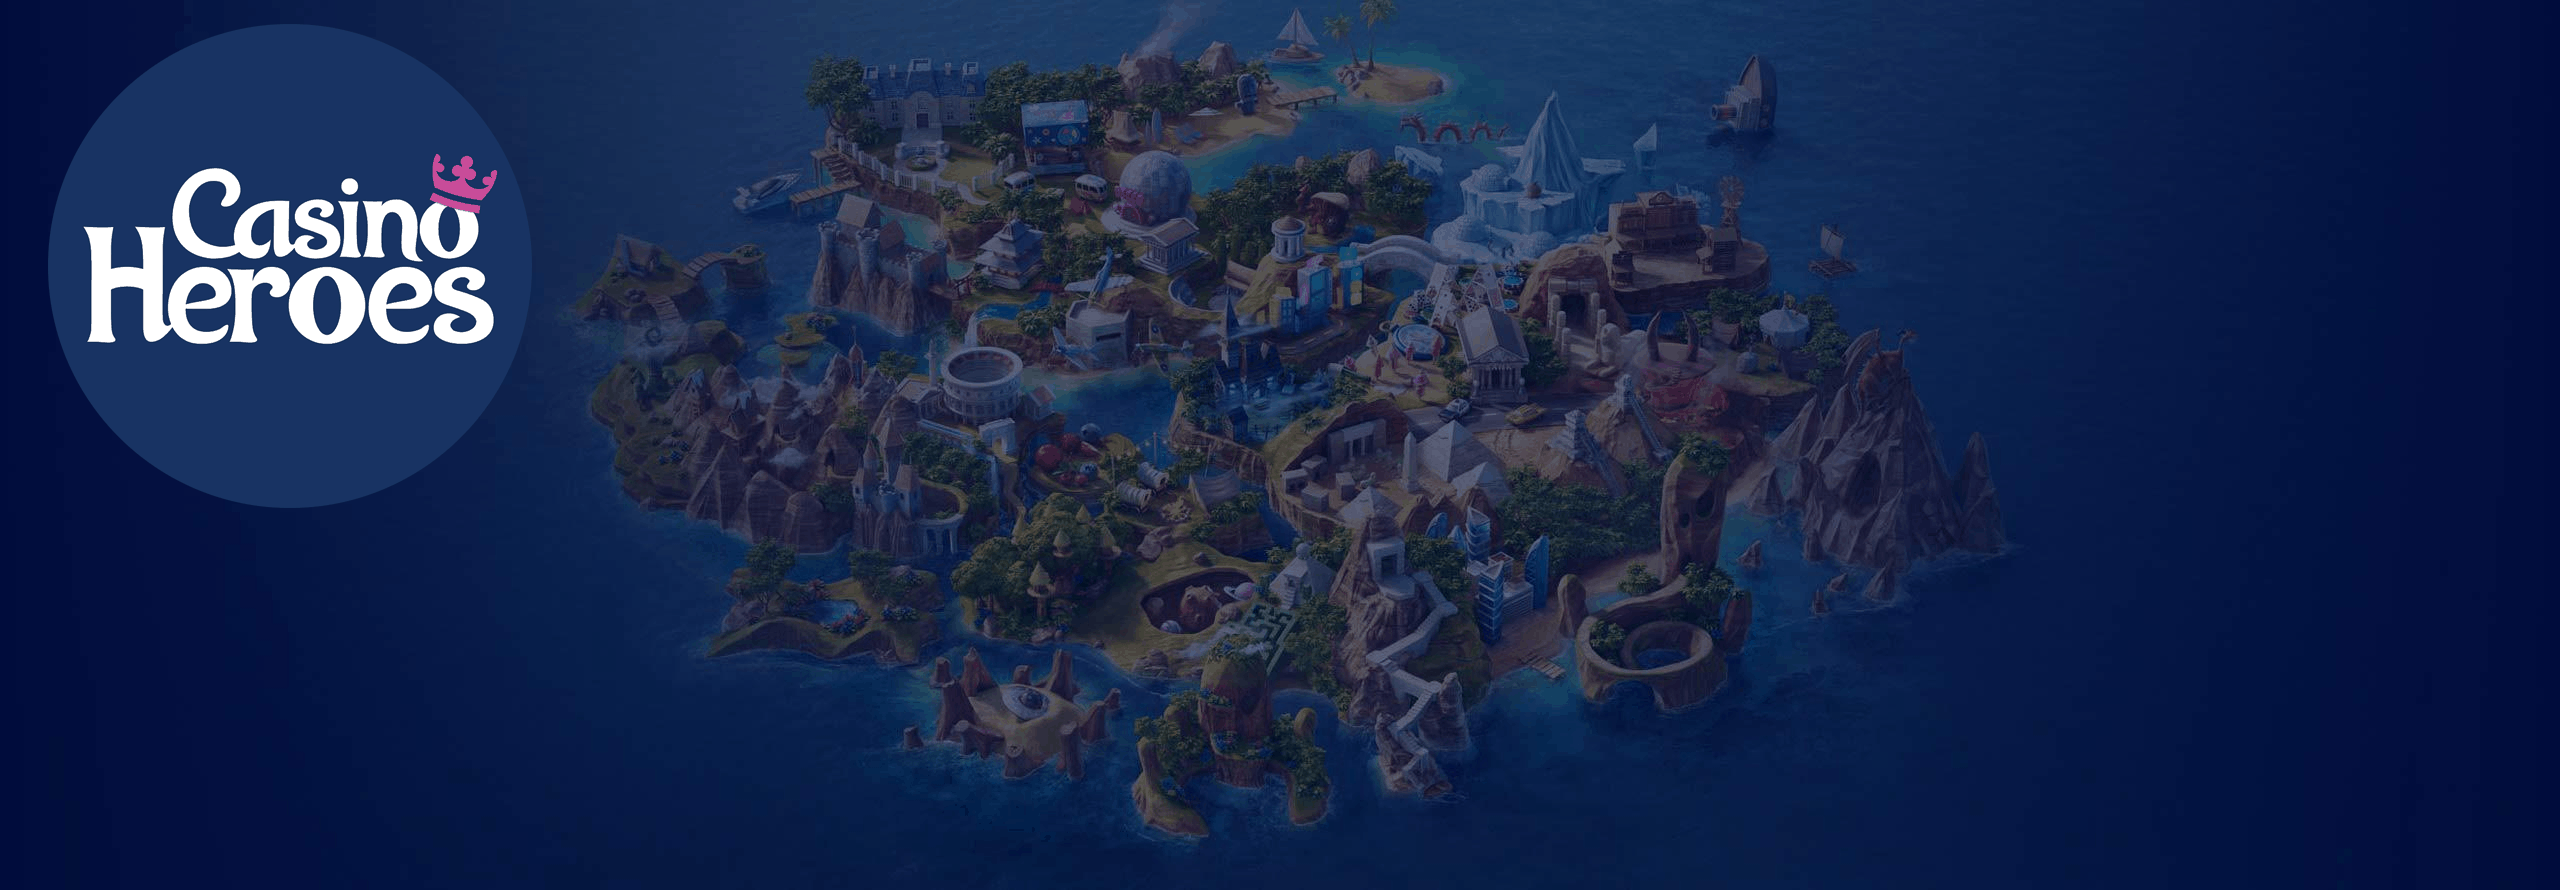 Casino Heroes Island